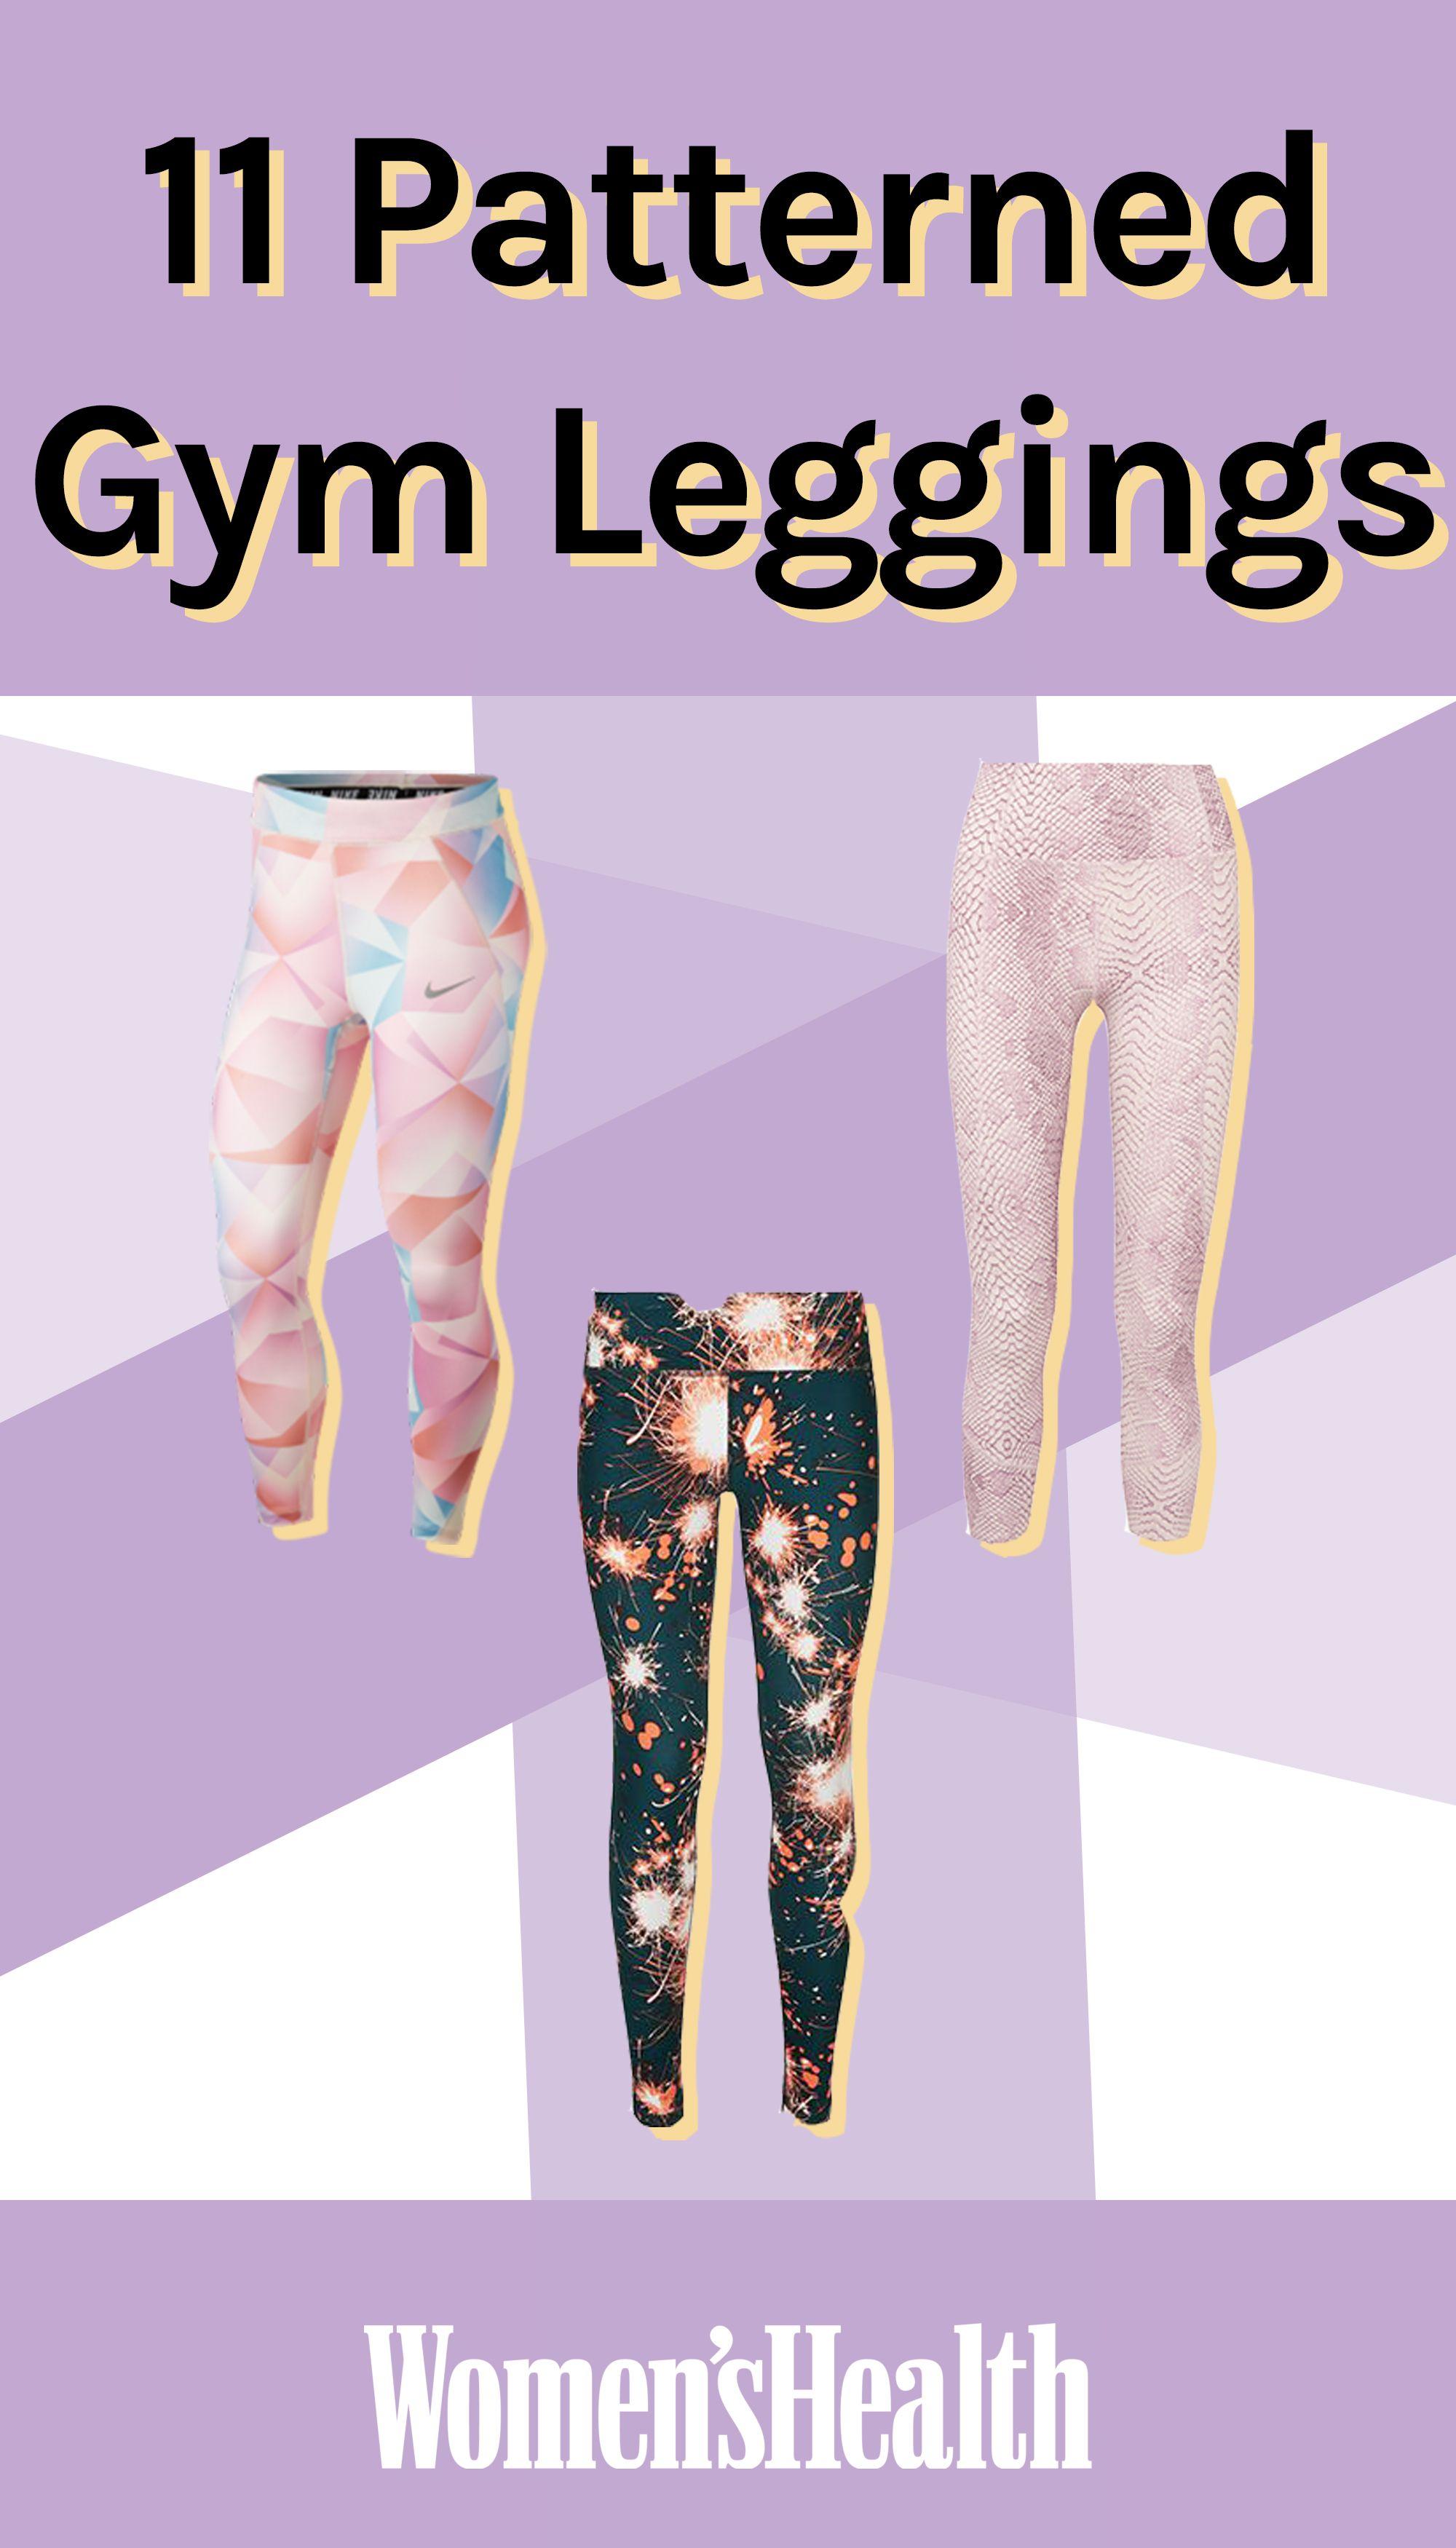 Patterned Gym Leggings